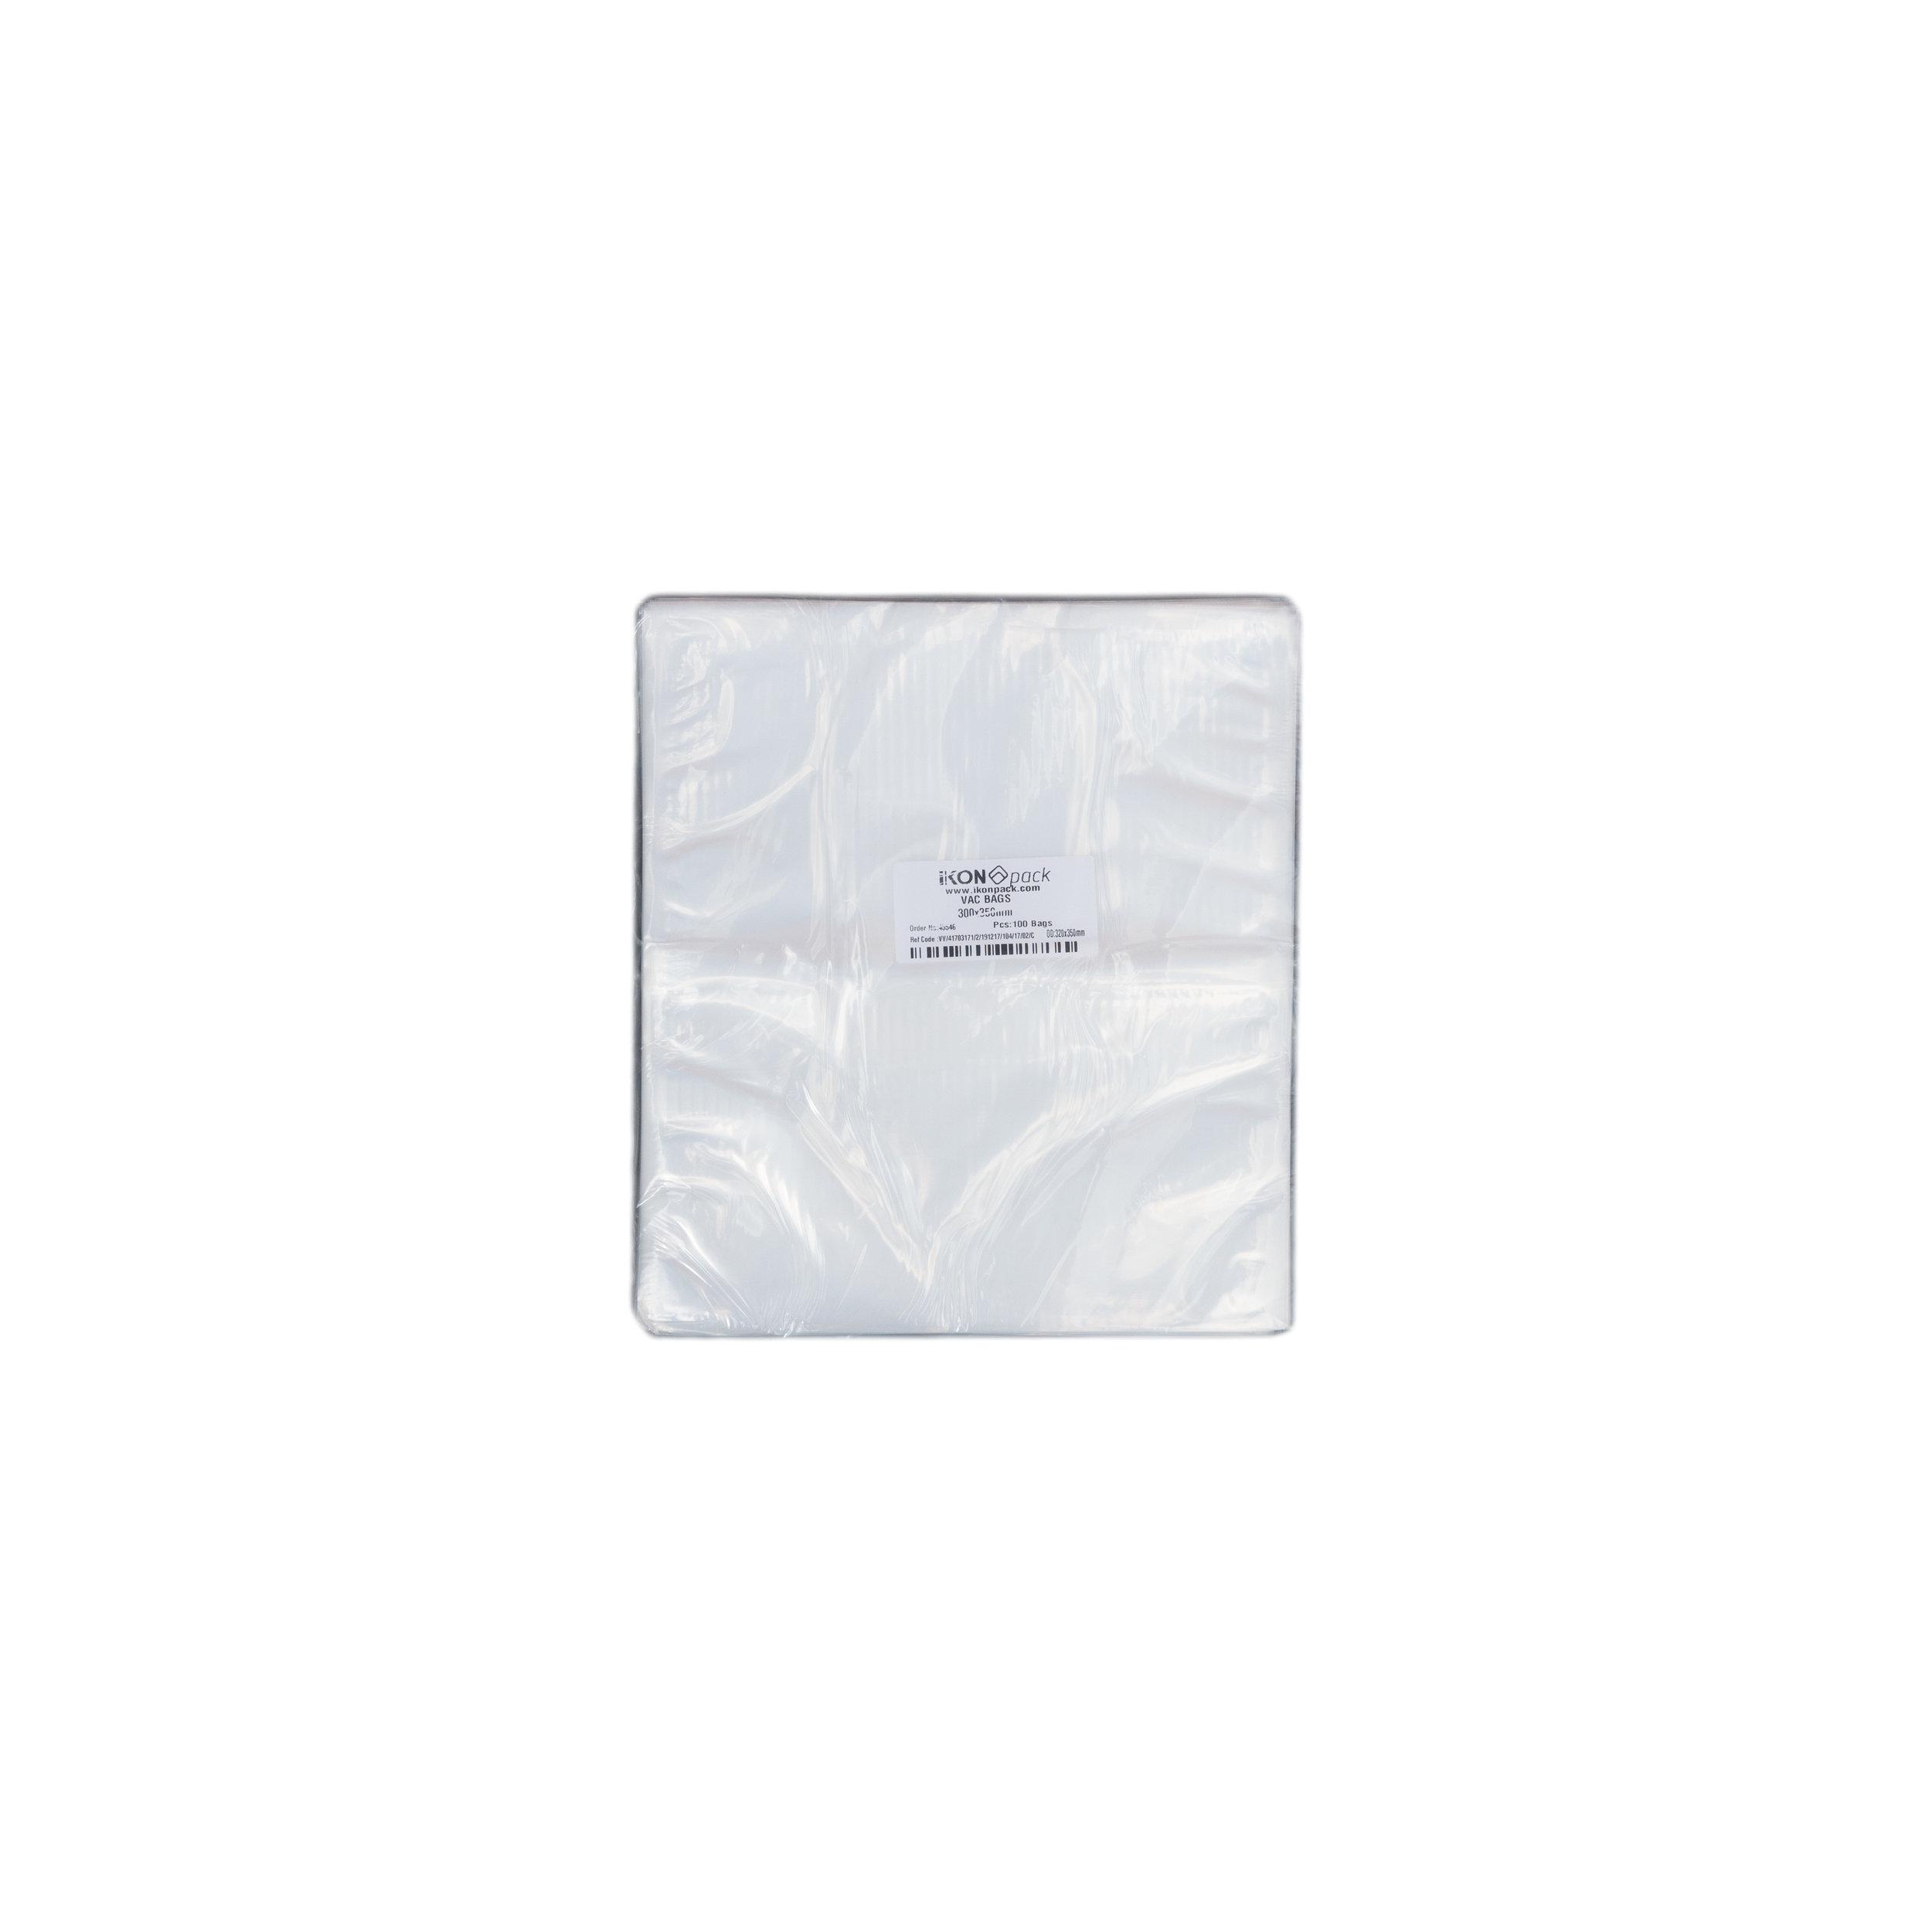 iK-VAC3035      VACUUM POUCH 70 MICRON 300X350    100 per slv 1000 per carton